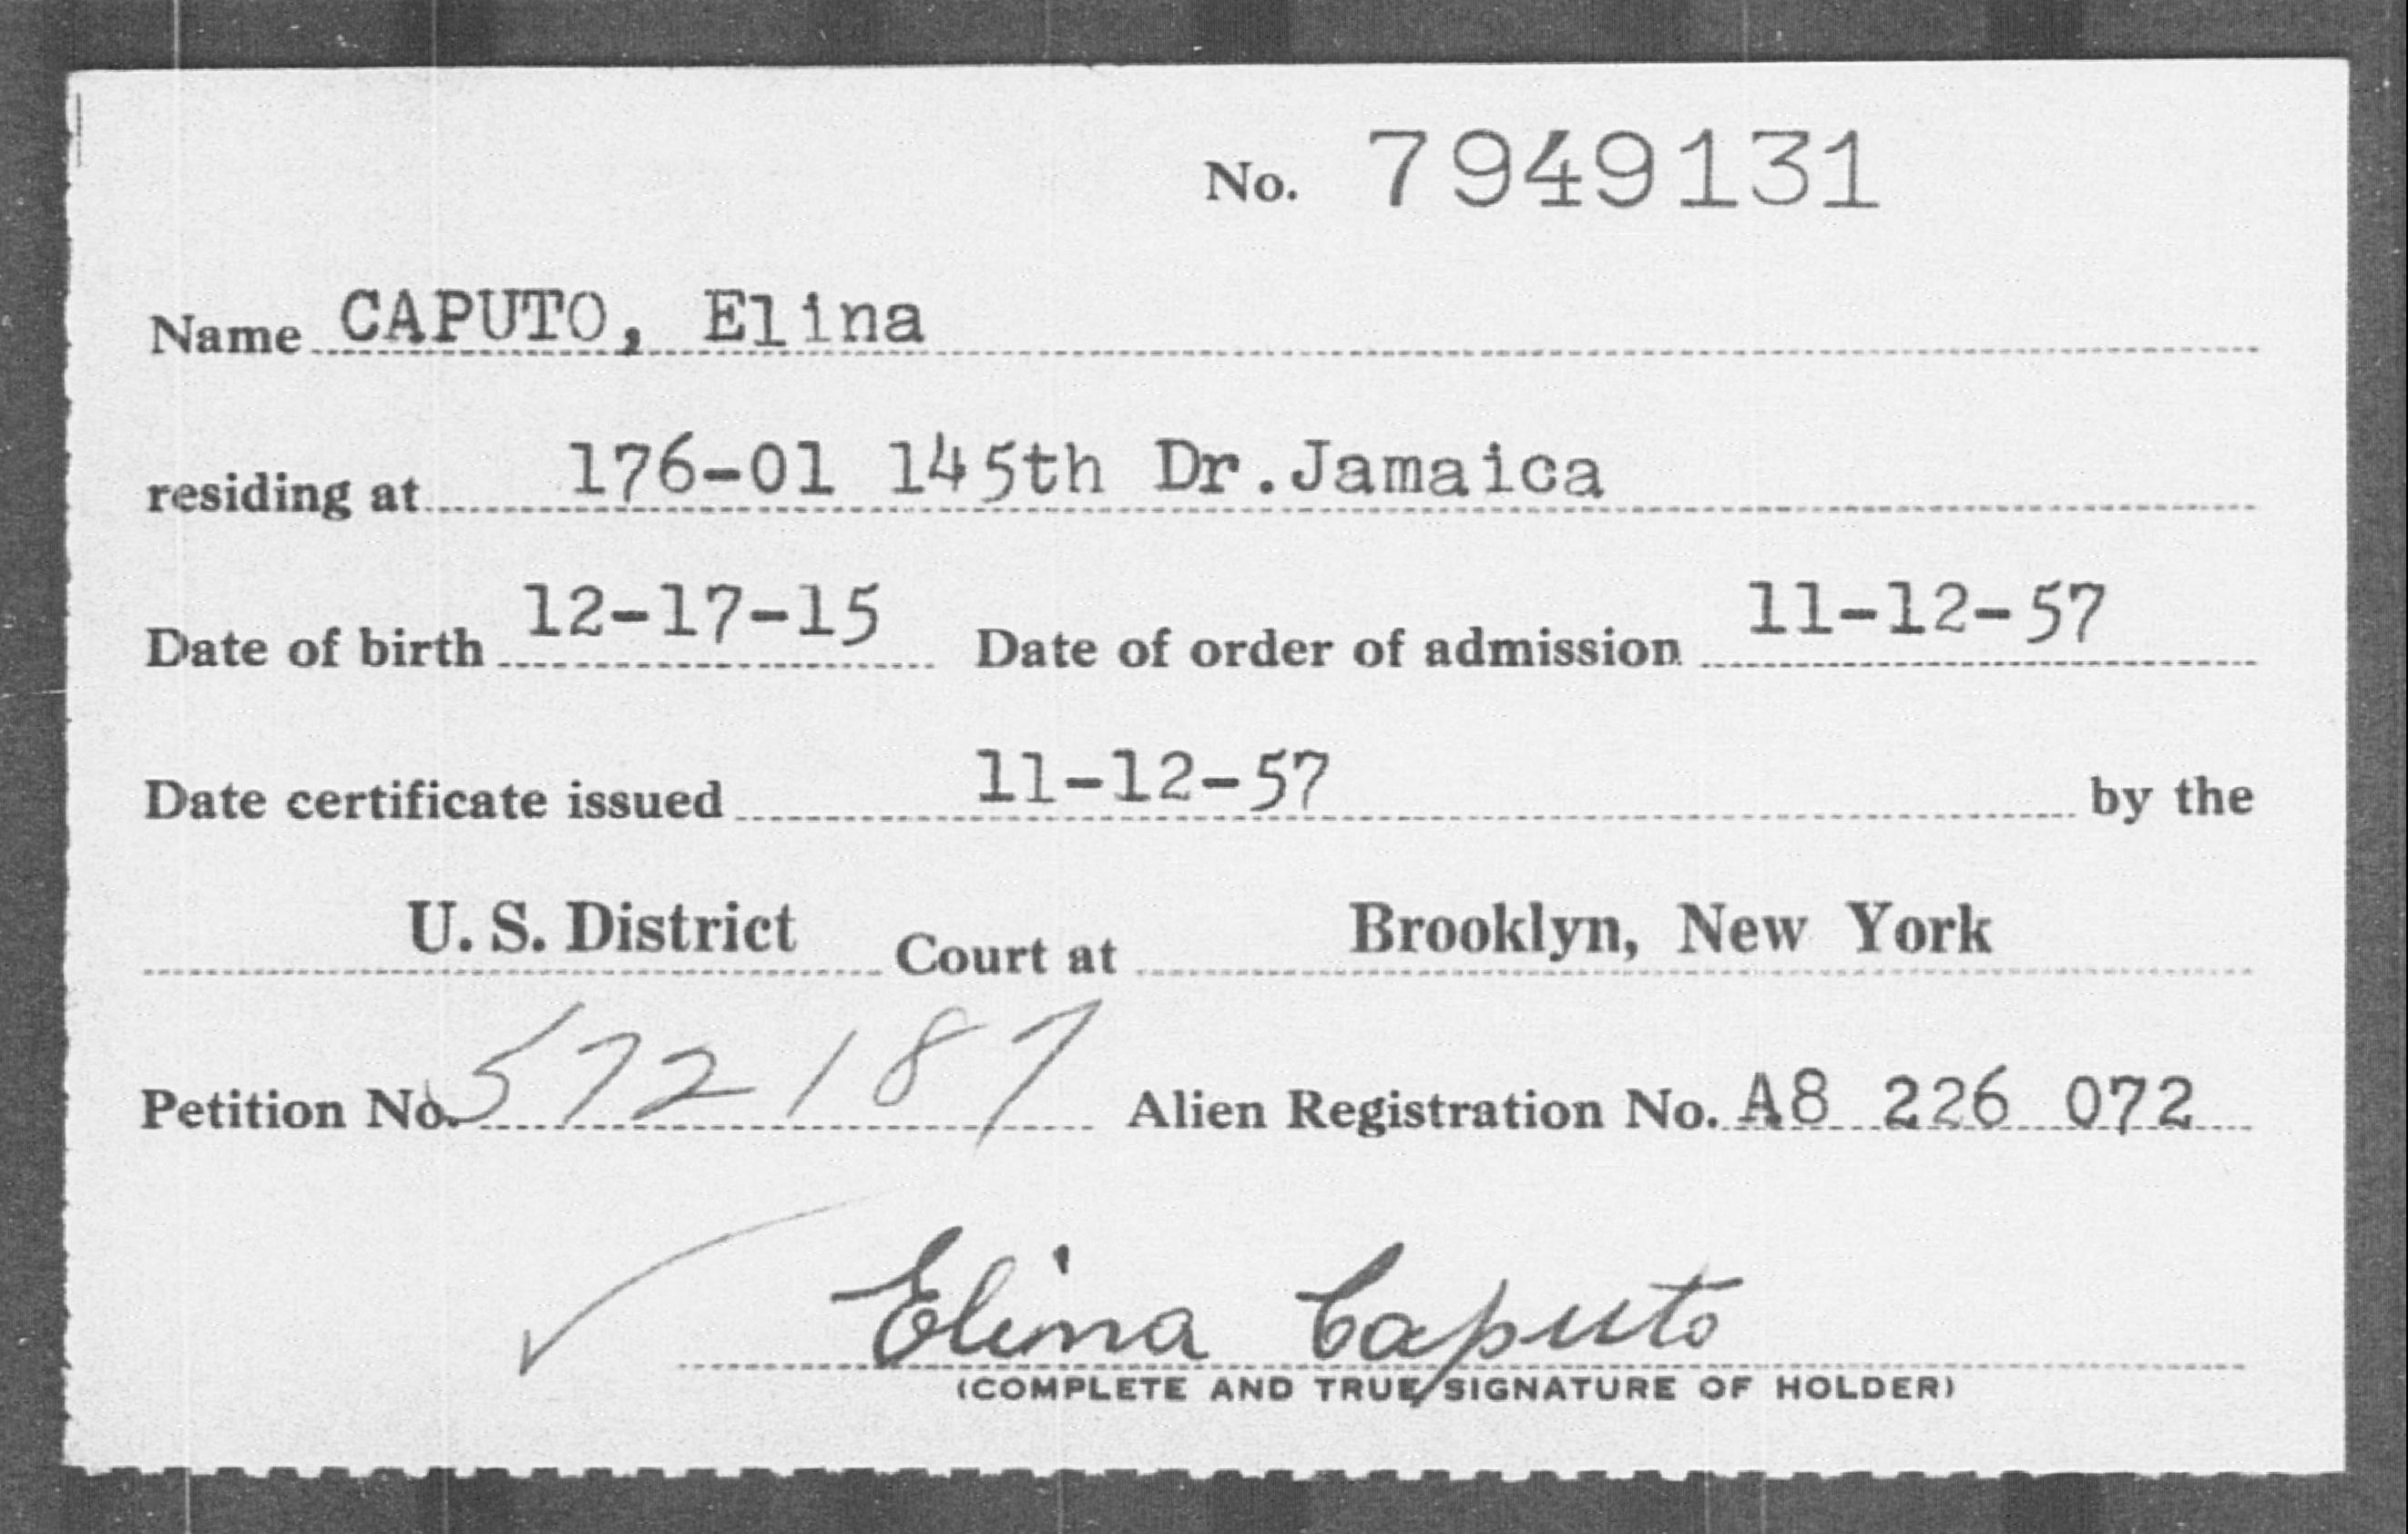 CAPUTO, Elina - Born: 1915, Naturalized: 1957